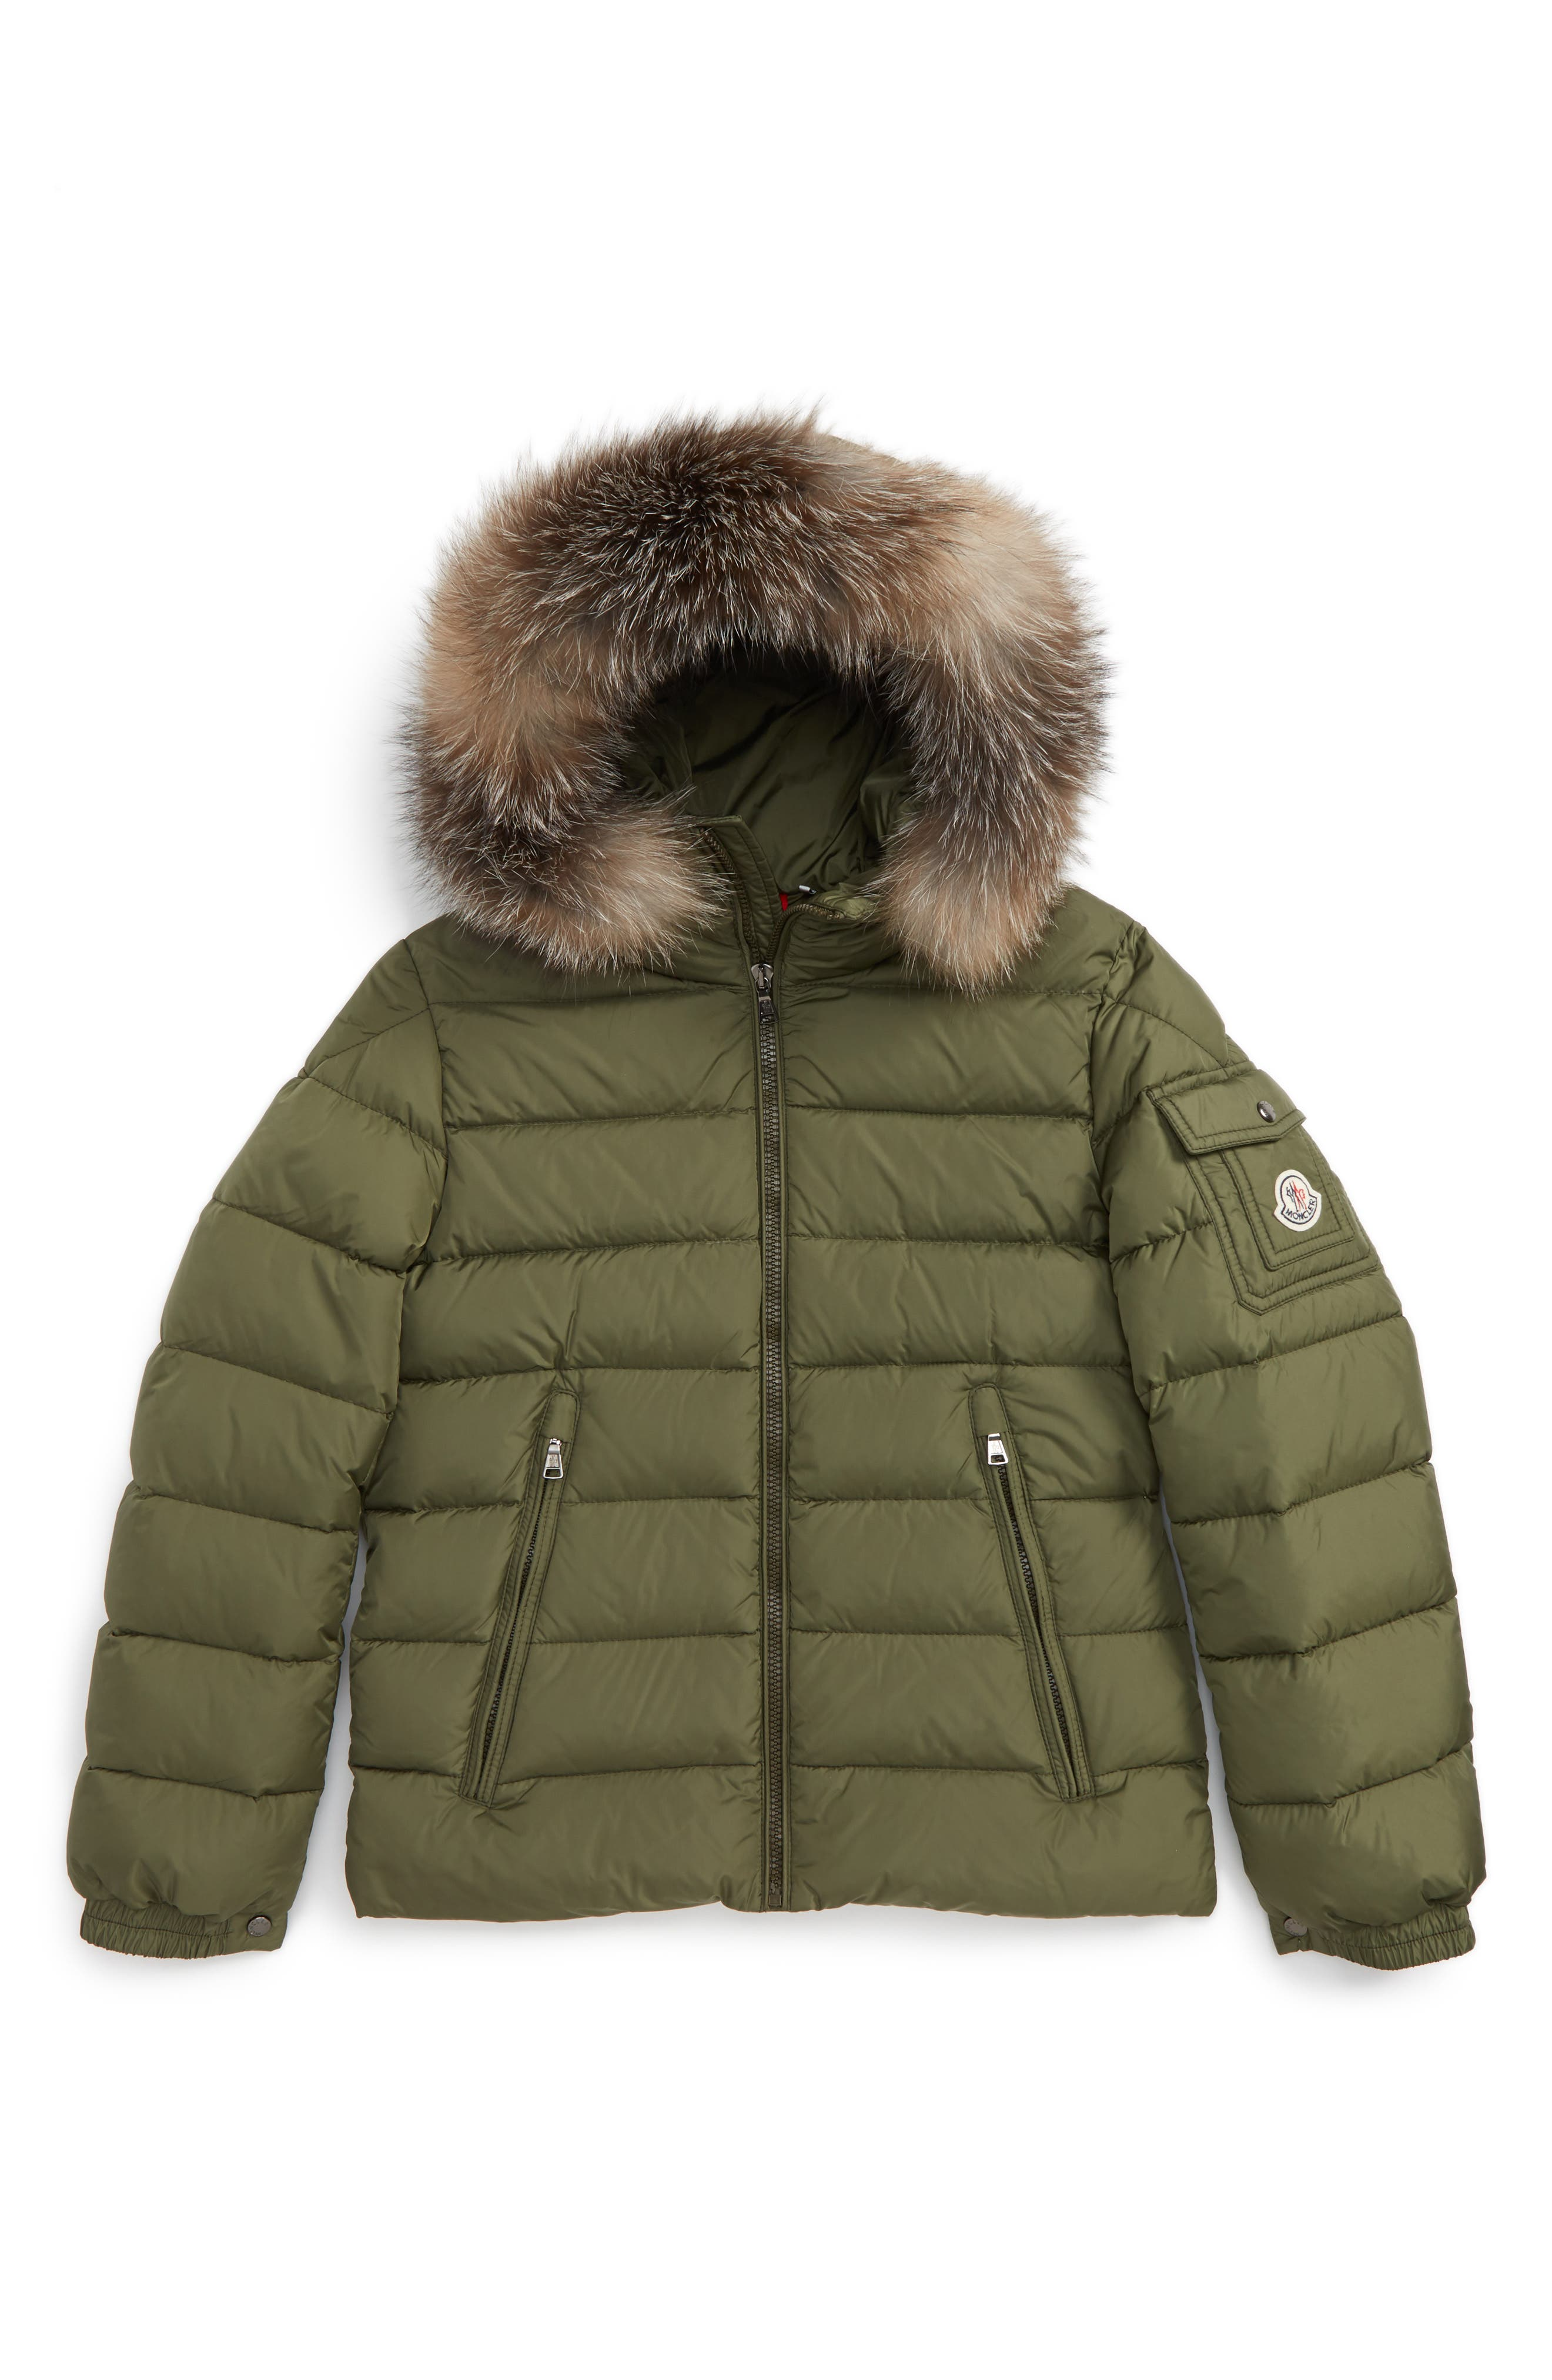 MONCLER Byron Water Resistant Down Jacket with Genuine Fox Fur Trim